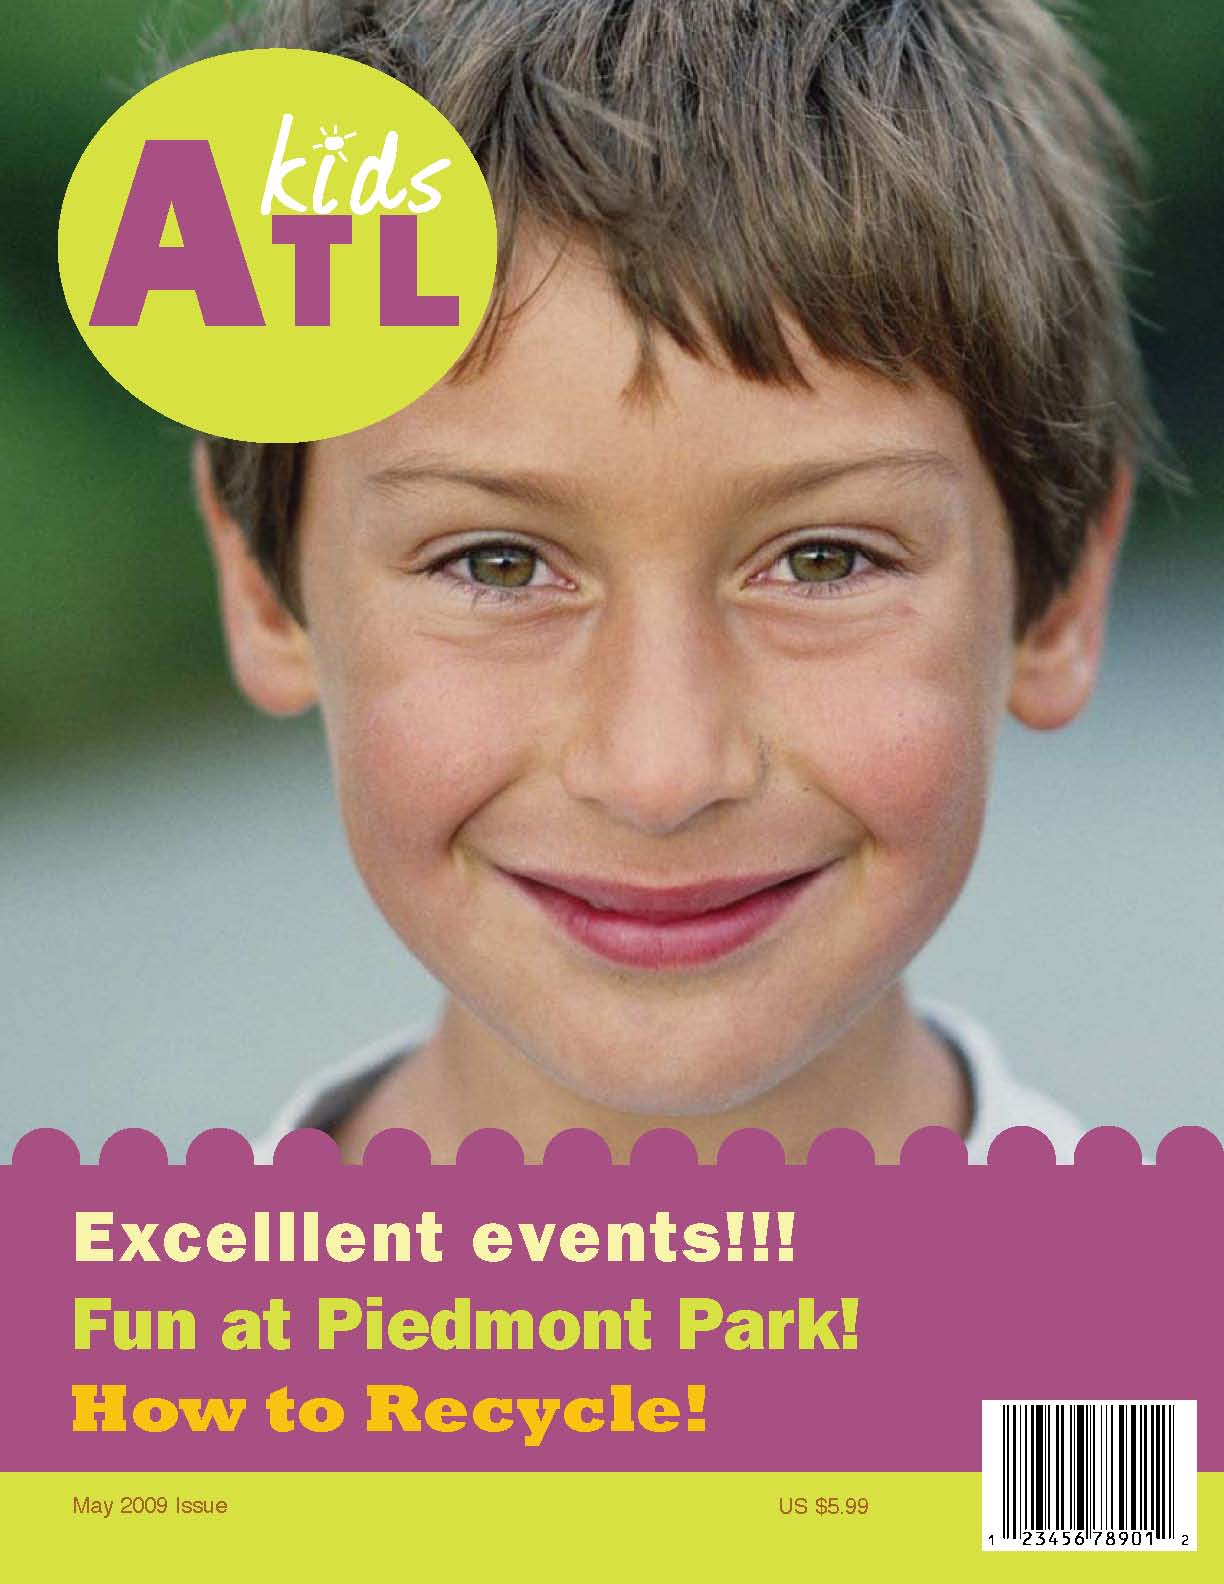 http://1.bp.blogspot.com/_5fbzUQcoFPg/TDAsVfYxcwI/AAAAAAAAAIM/NYzrKnt9DDI/s1600/ATL_kids_magazine_v10_Page_1.jpg